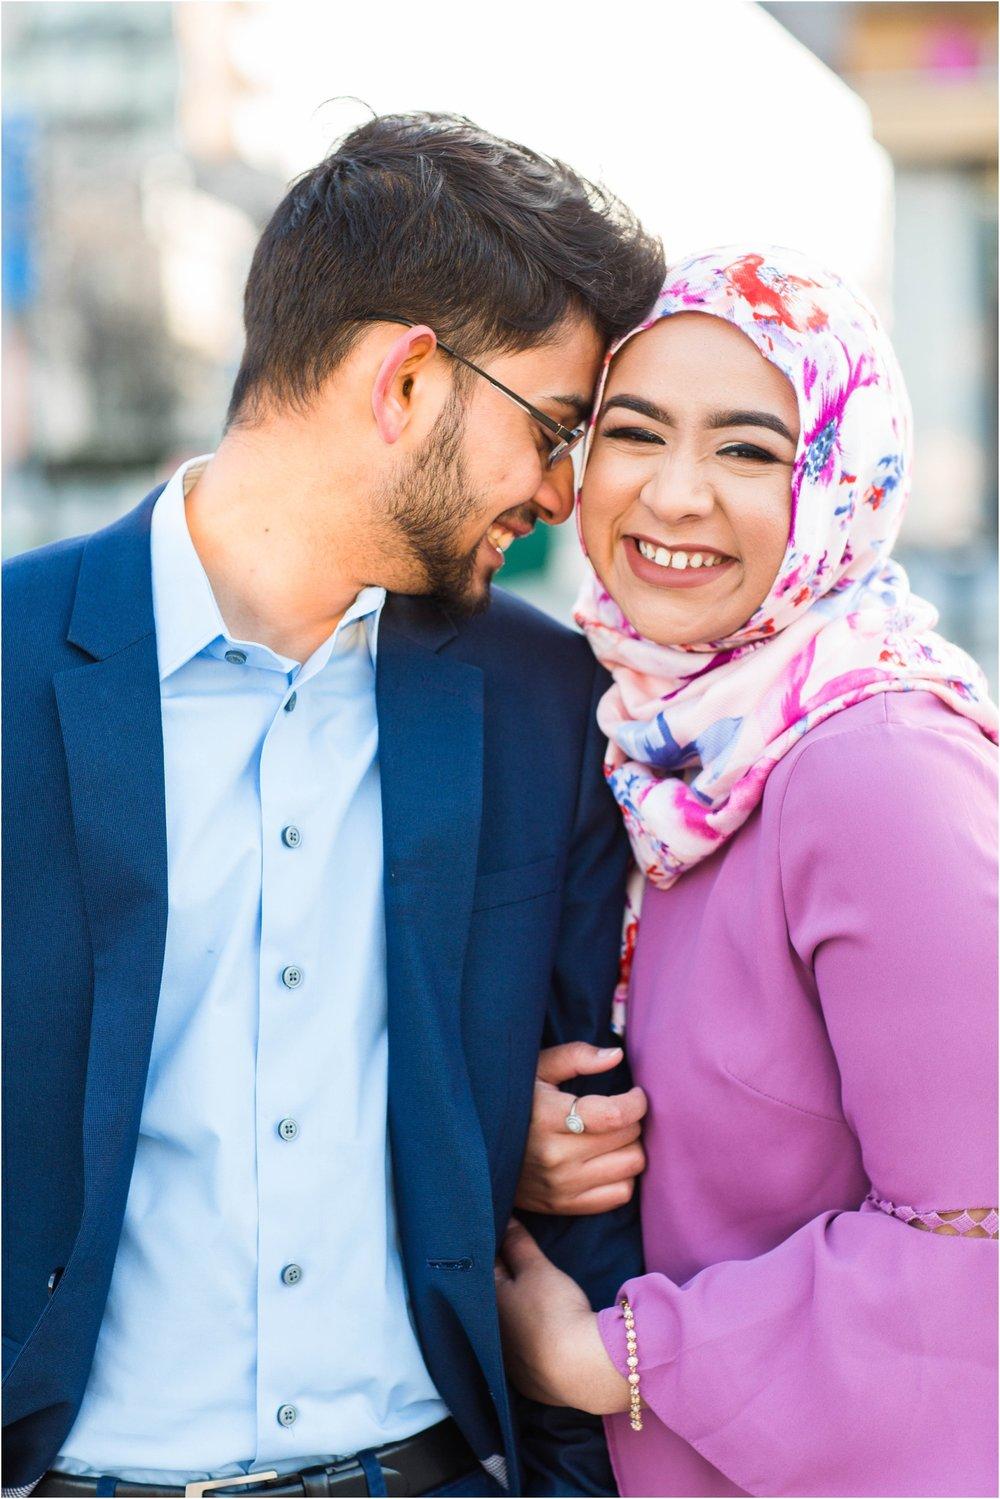 Shops-at-Don-Mills-Engagement-Session-Toronto-Mississauga-Brampton-Scarborough-GTA-Pakistani-Indian-Wedding-Engagement-Photographer-Photography_0029.jpg